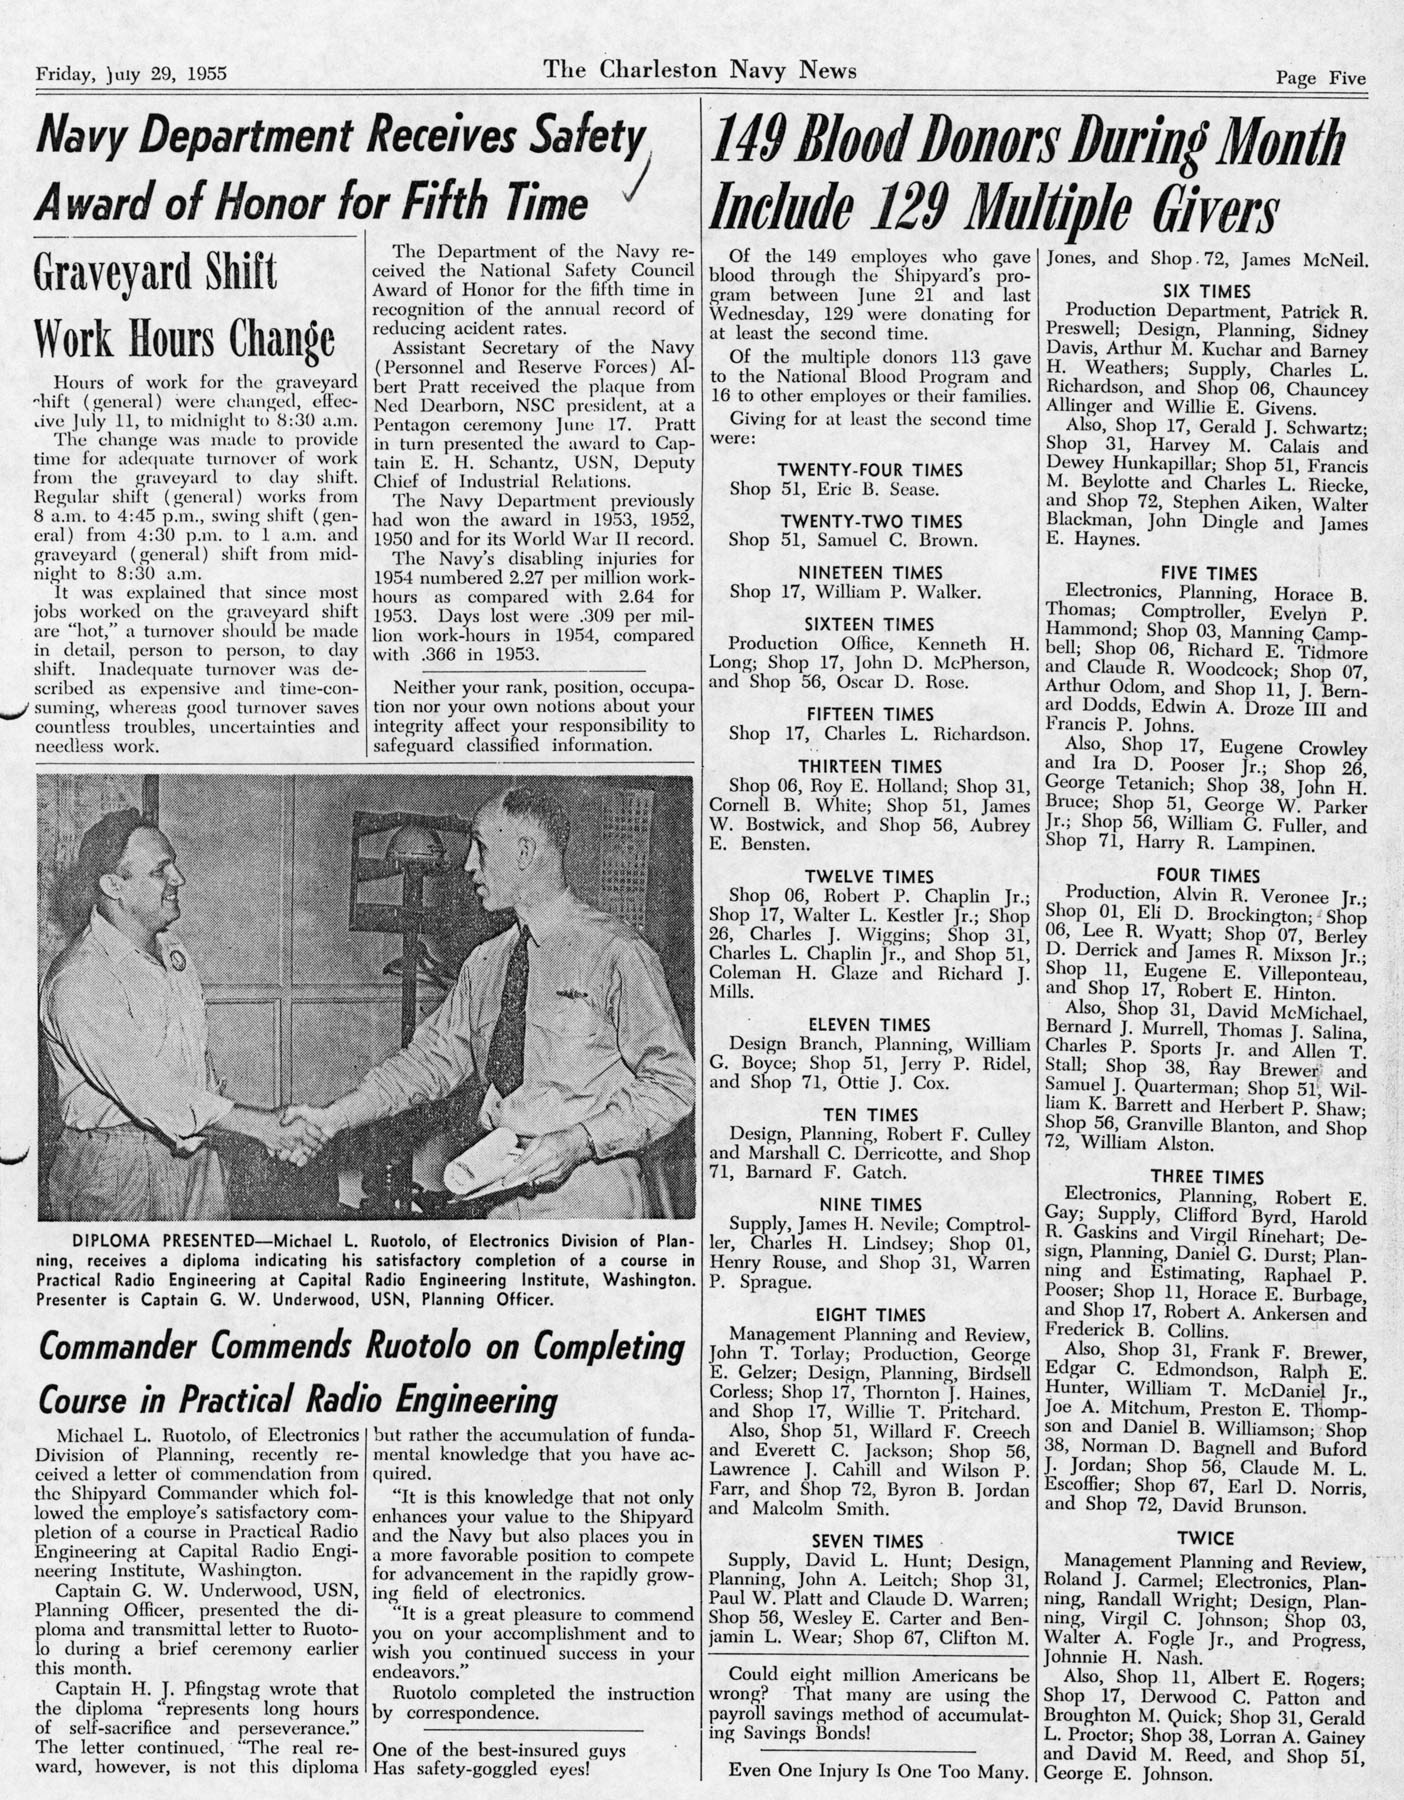 The Charleston Navy News, Volume 14, Edition 1, page v